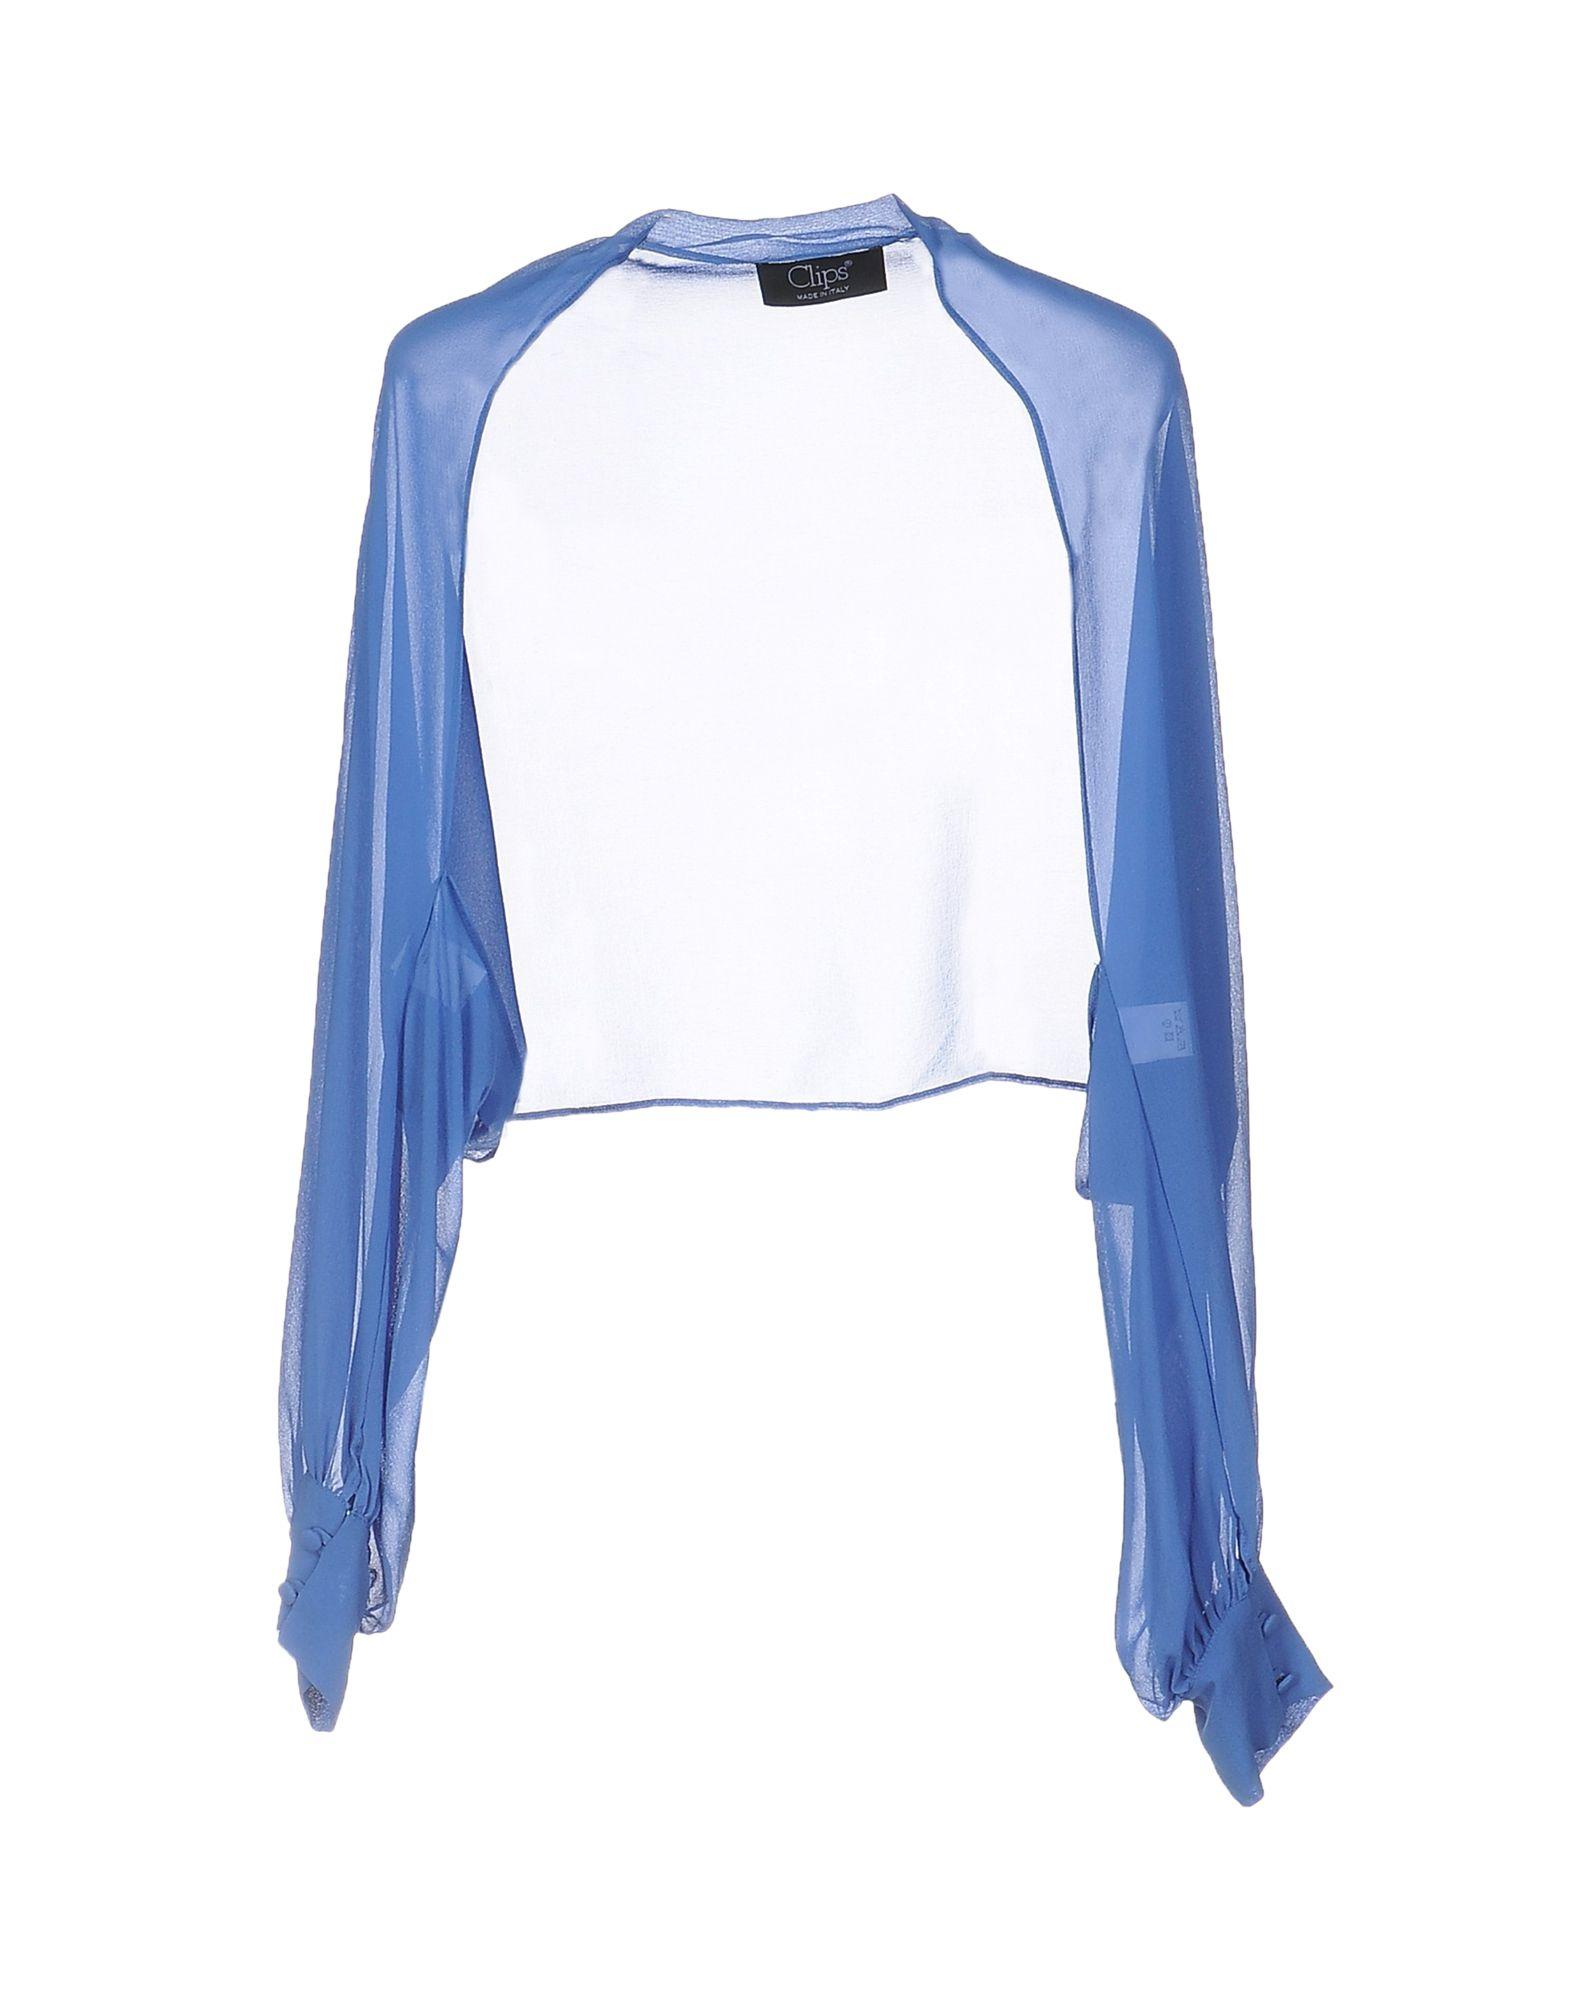 CLIPS Damen Bolero Farbe Königsblau Größe 8